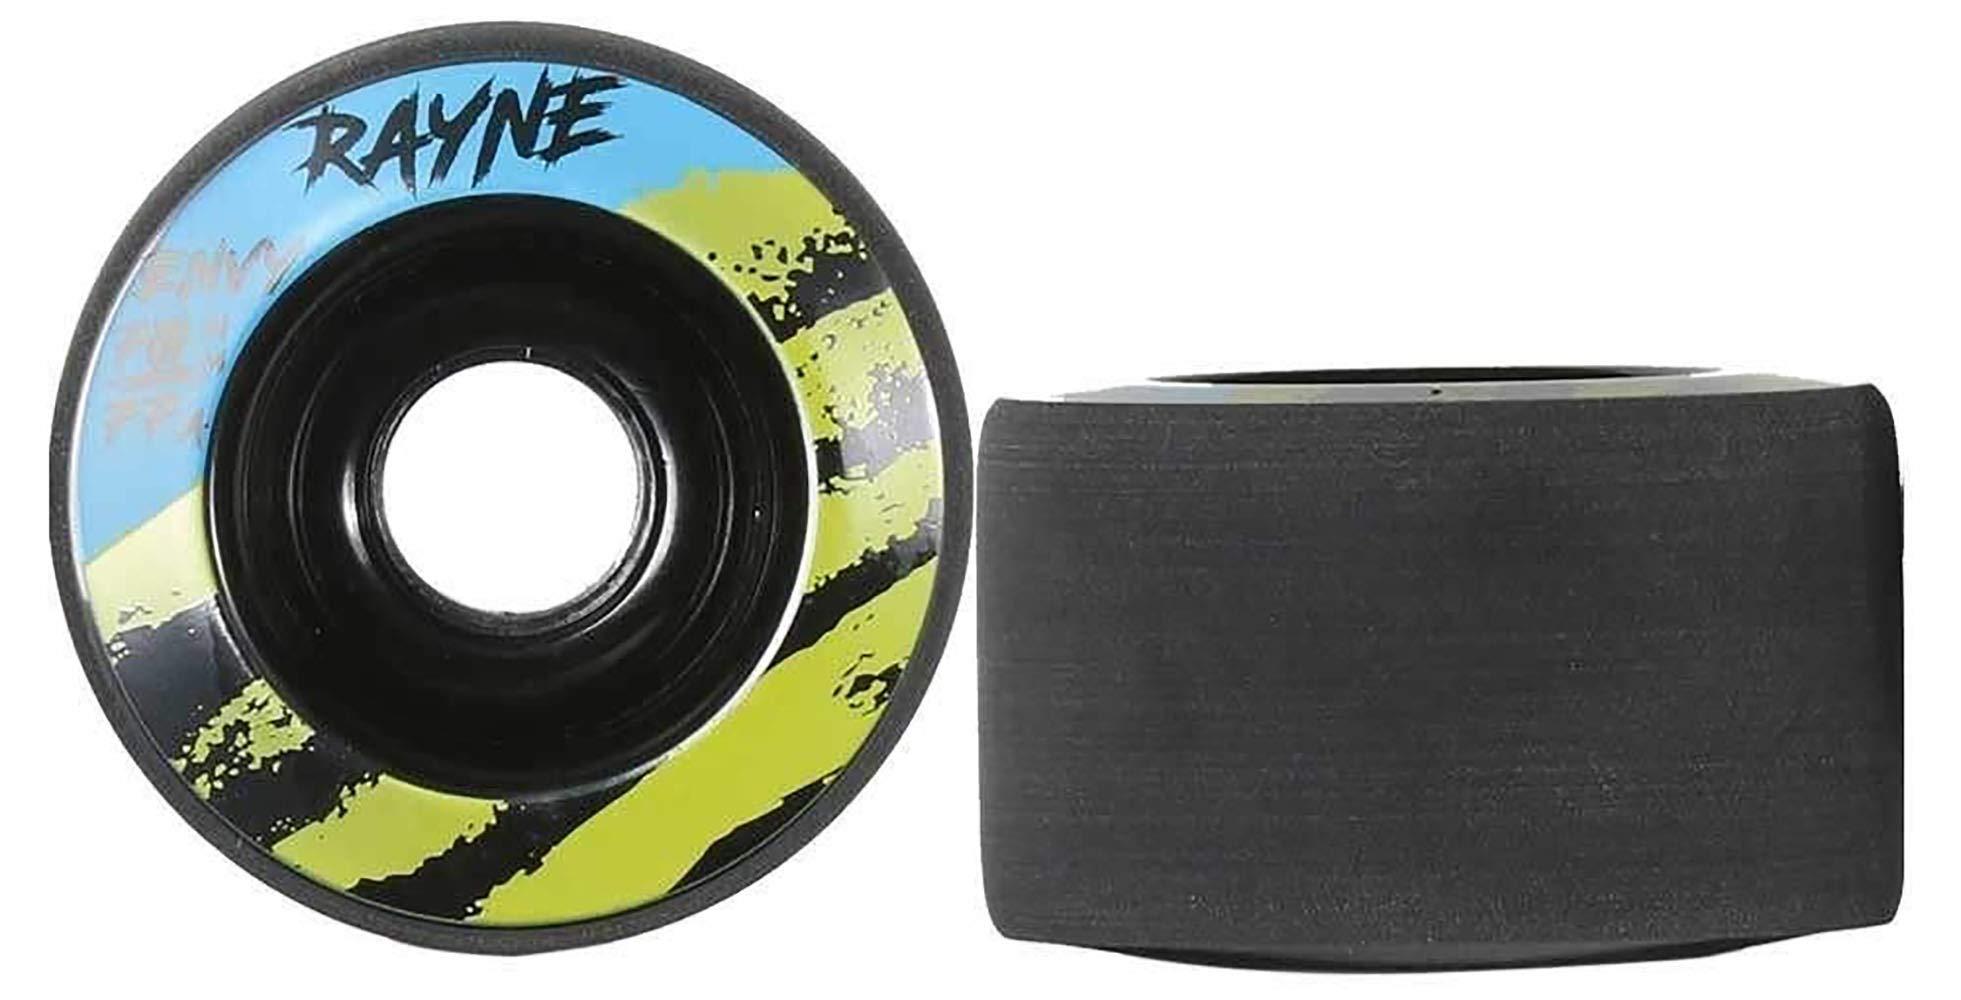 Rayne Envy 70mm 77A, 80A Uretano Longboard Juego de ruedas